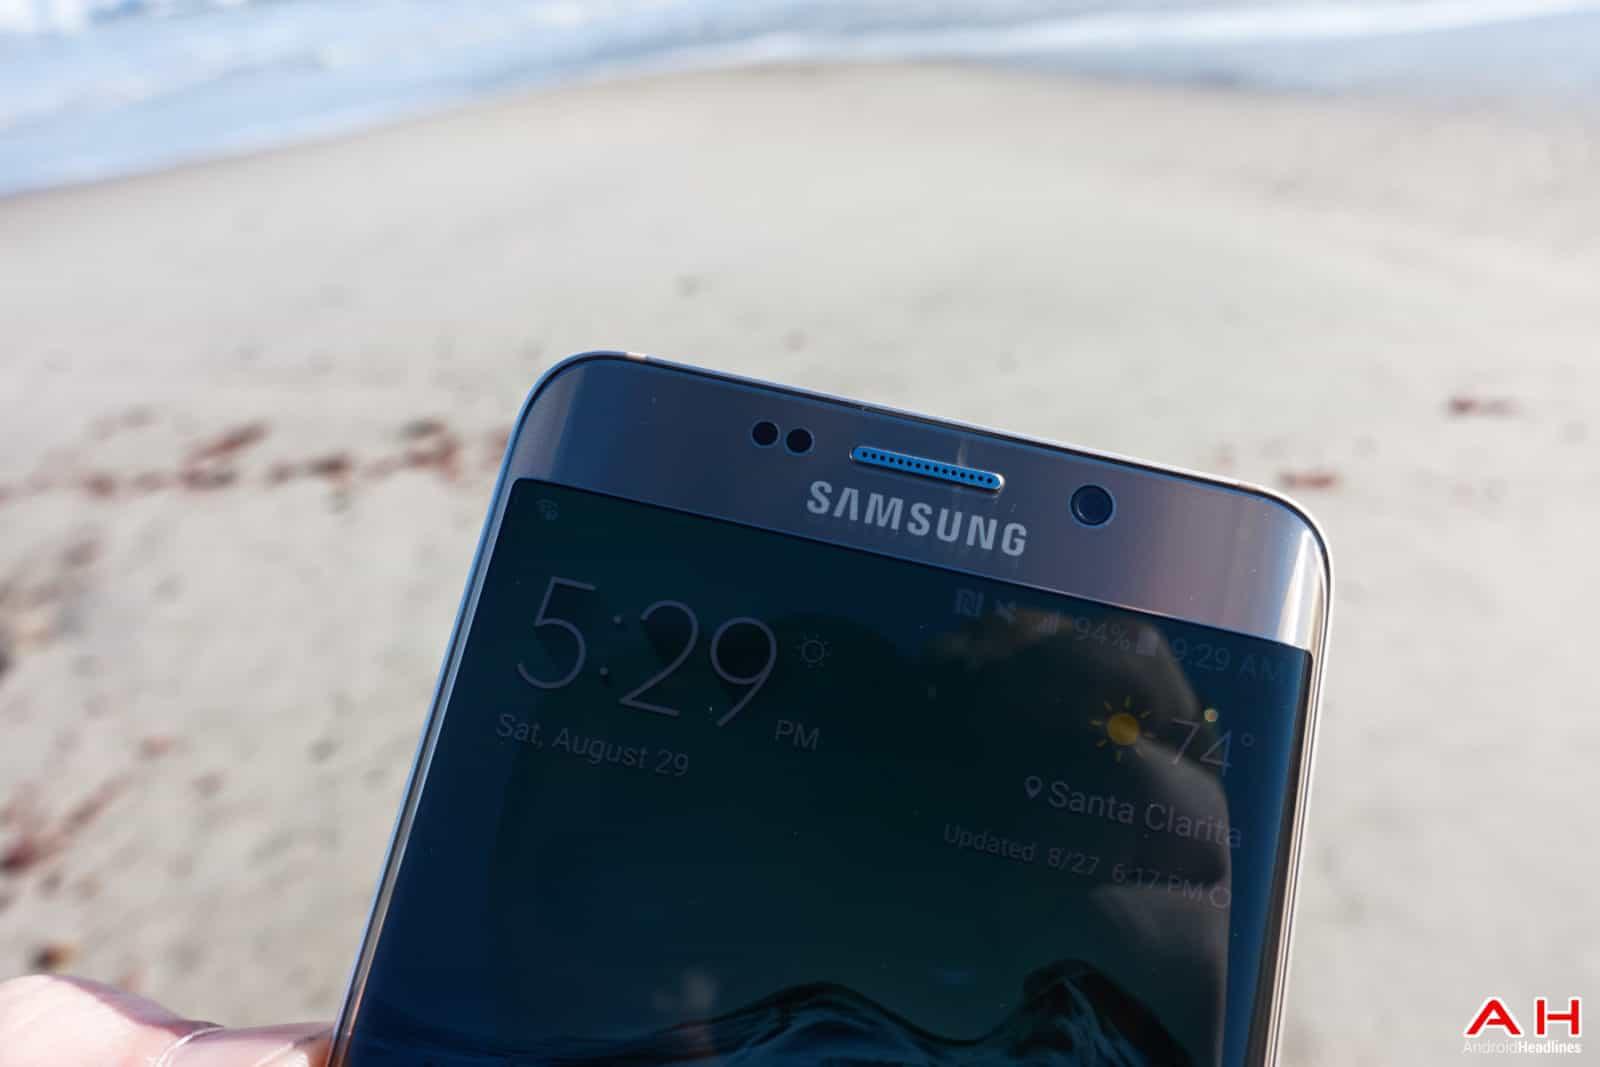 AH Samsung Galaxy S6 Plus + 2015 Chris-12